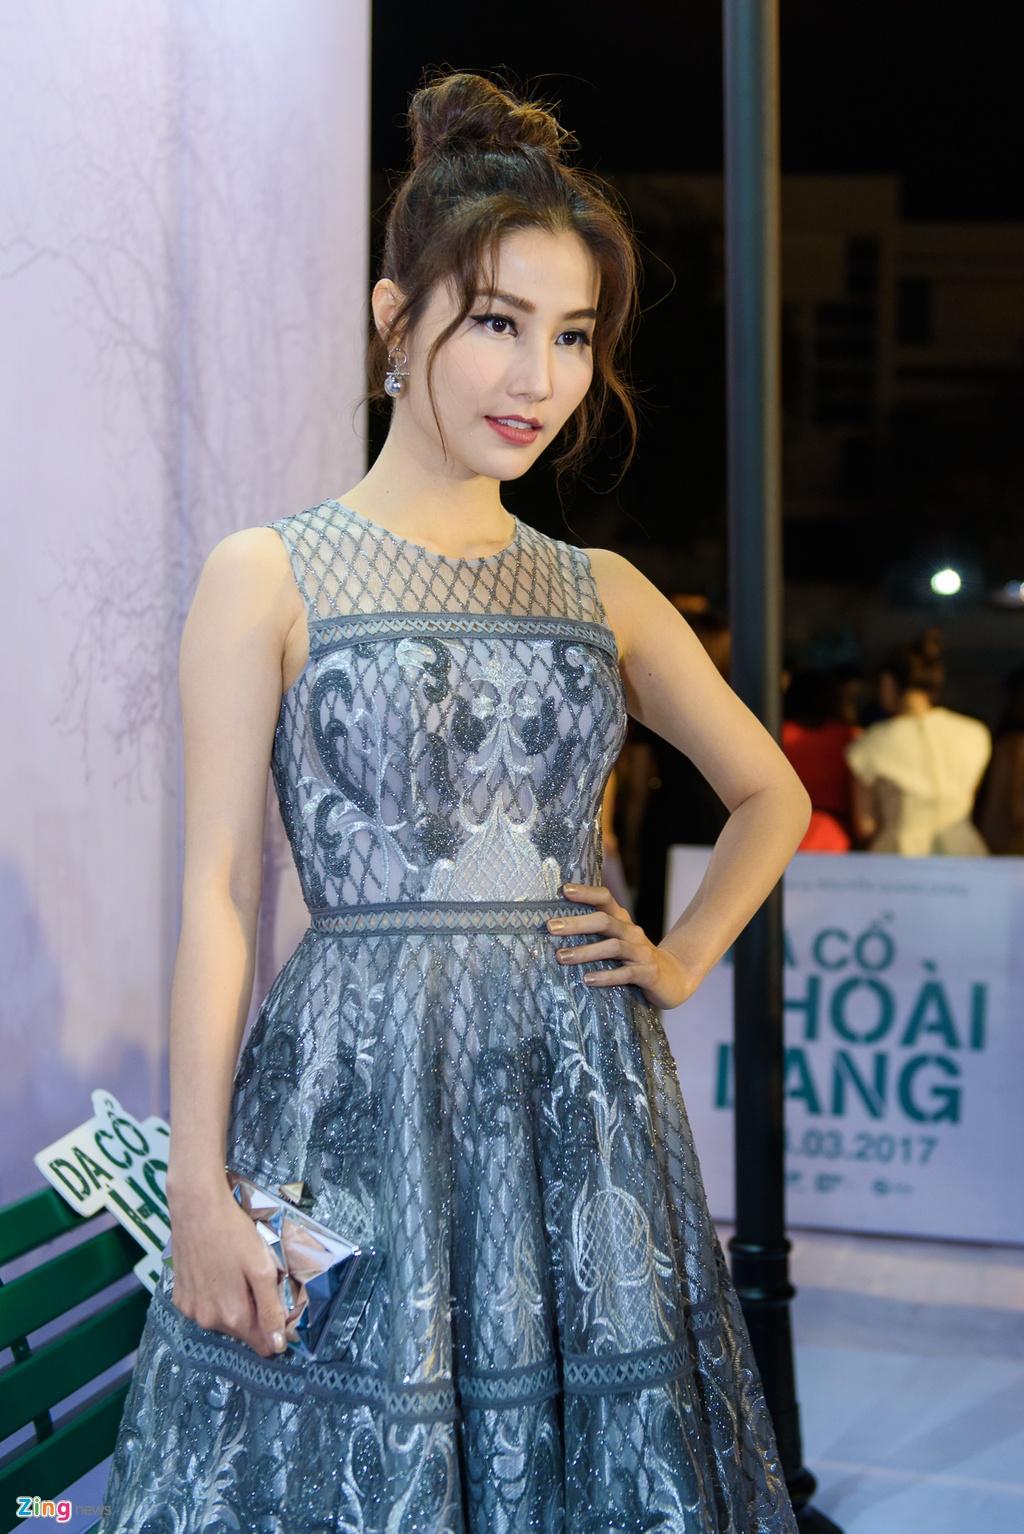 Hoai Linh va dan sao Viet tren tham do ra mat phim 'Da co hoai lang' hinh anh 8